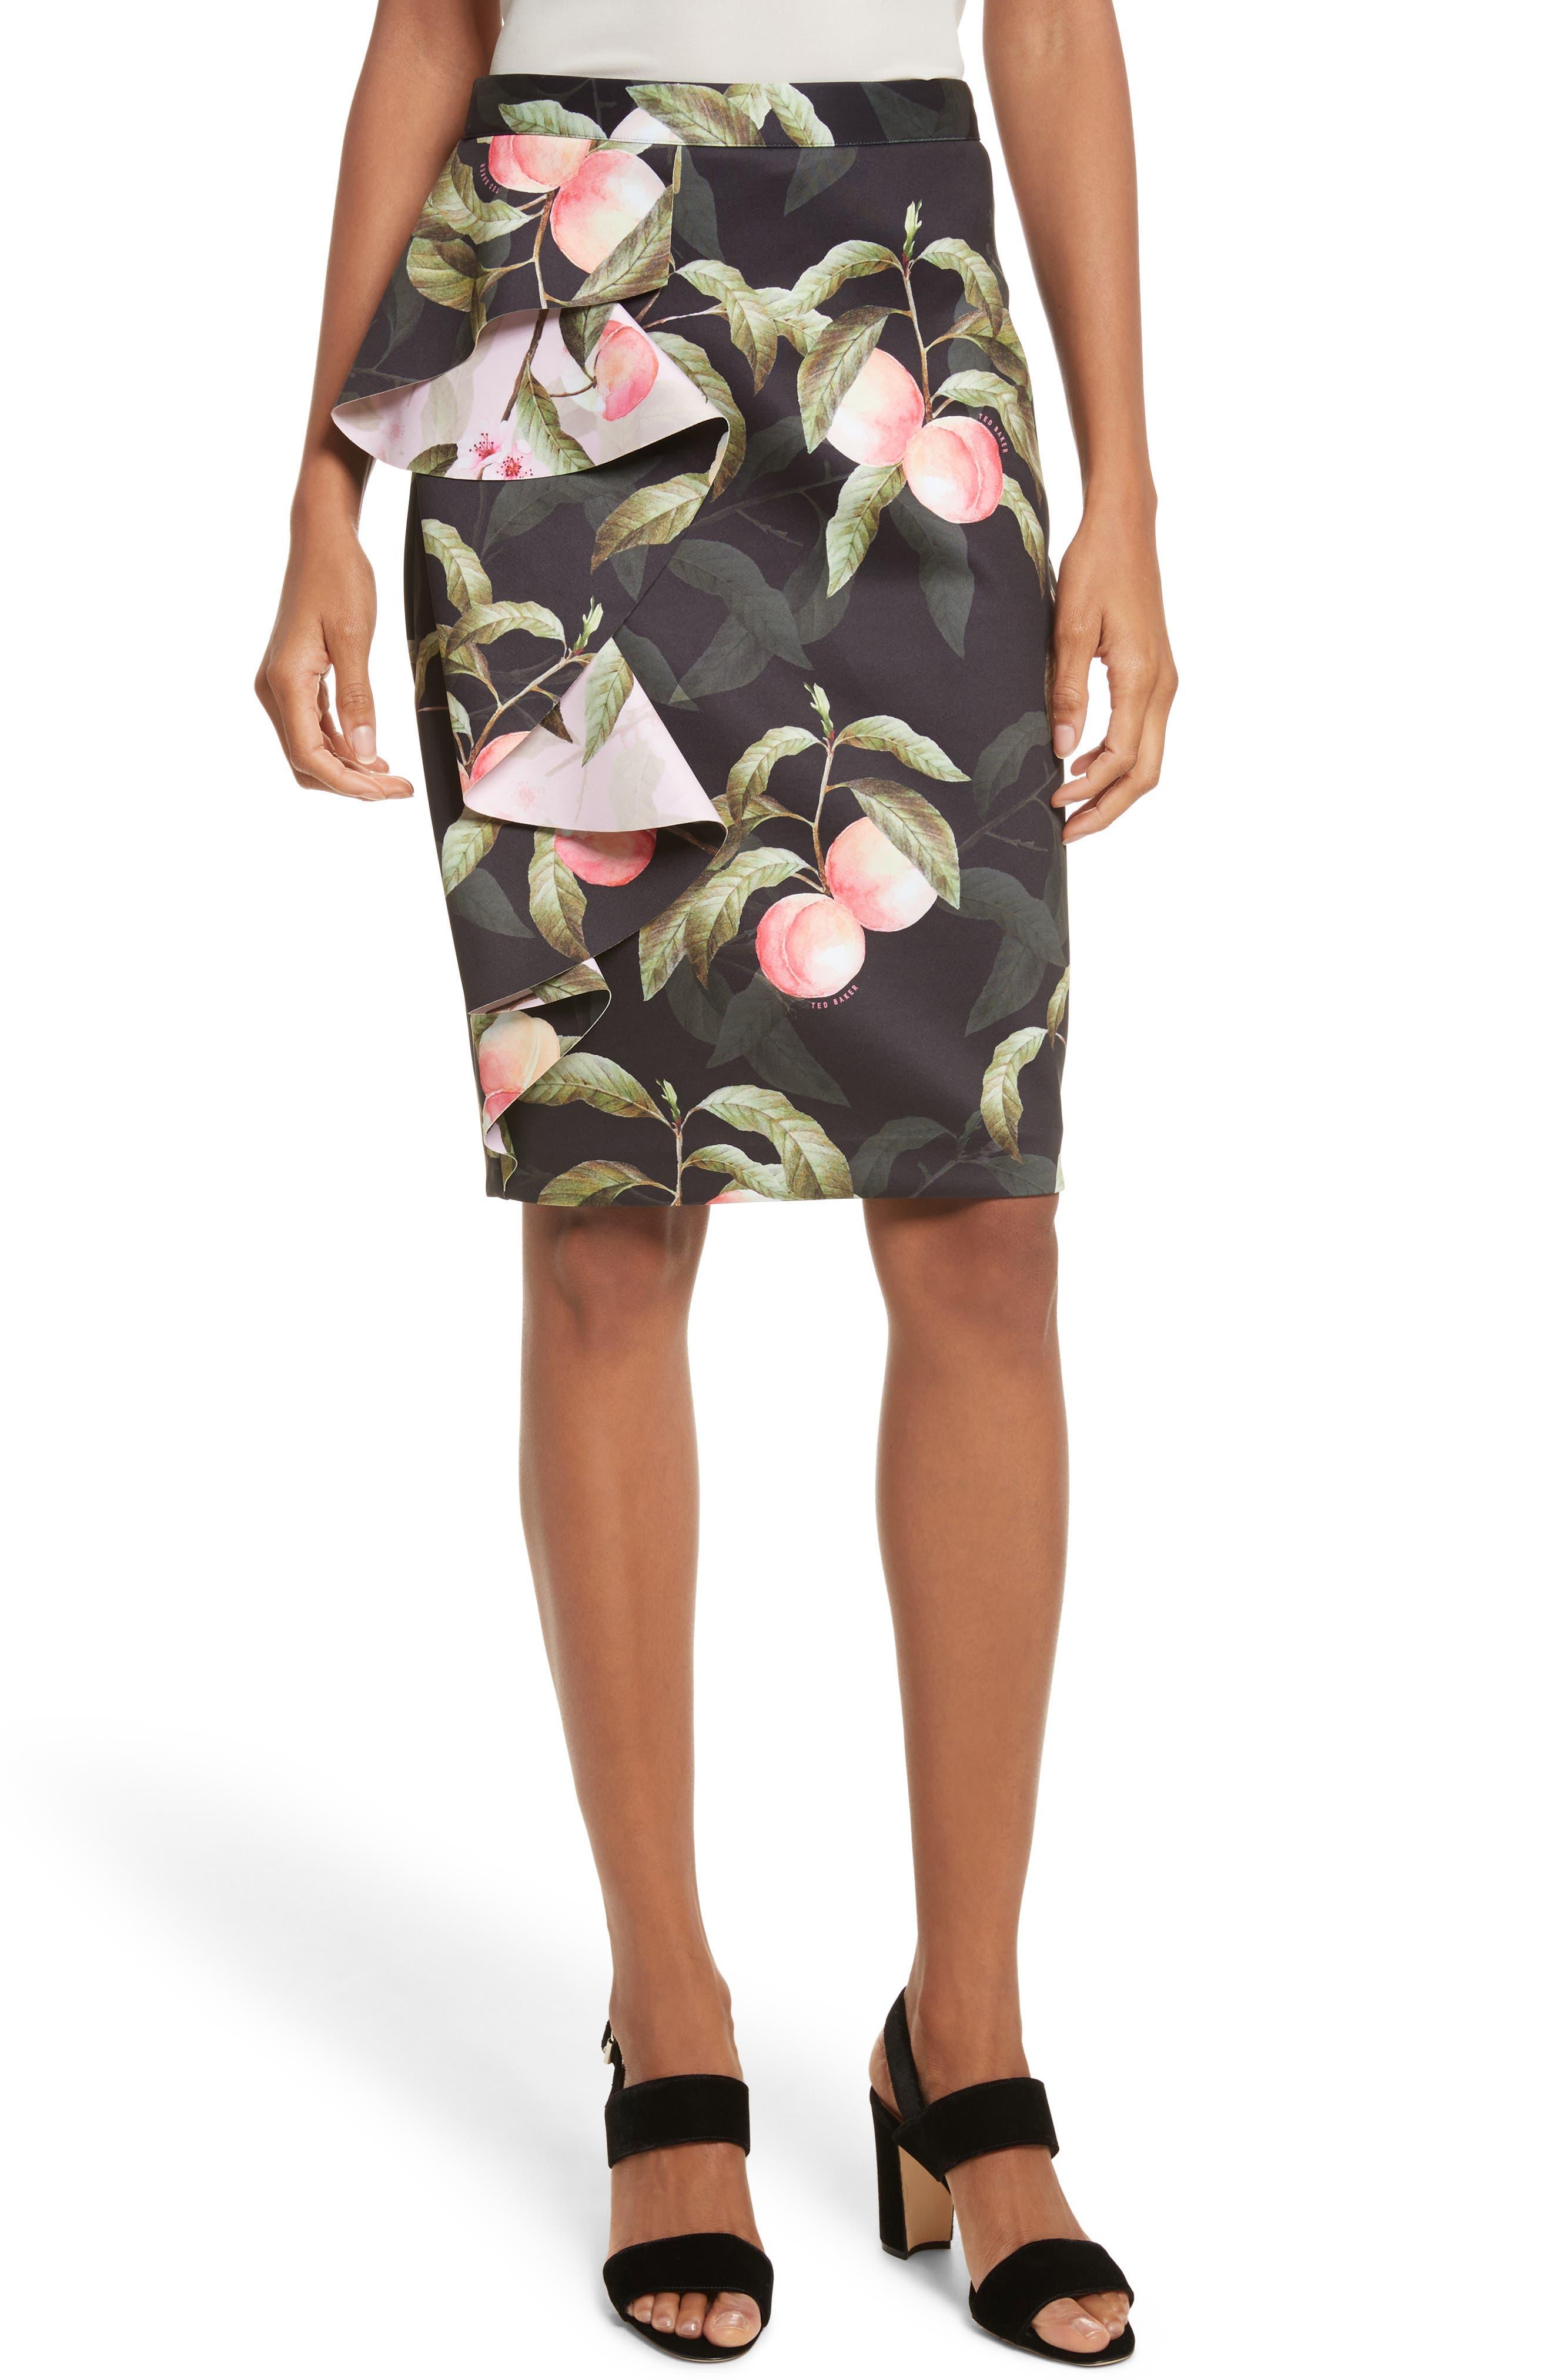 Alternate Image 1 Selected - Ted Baker London Peaches Ruffle Pencil Skirt